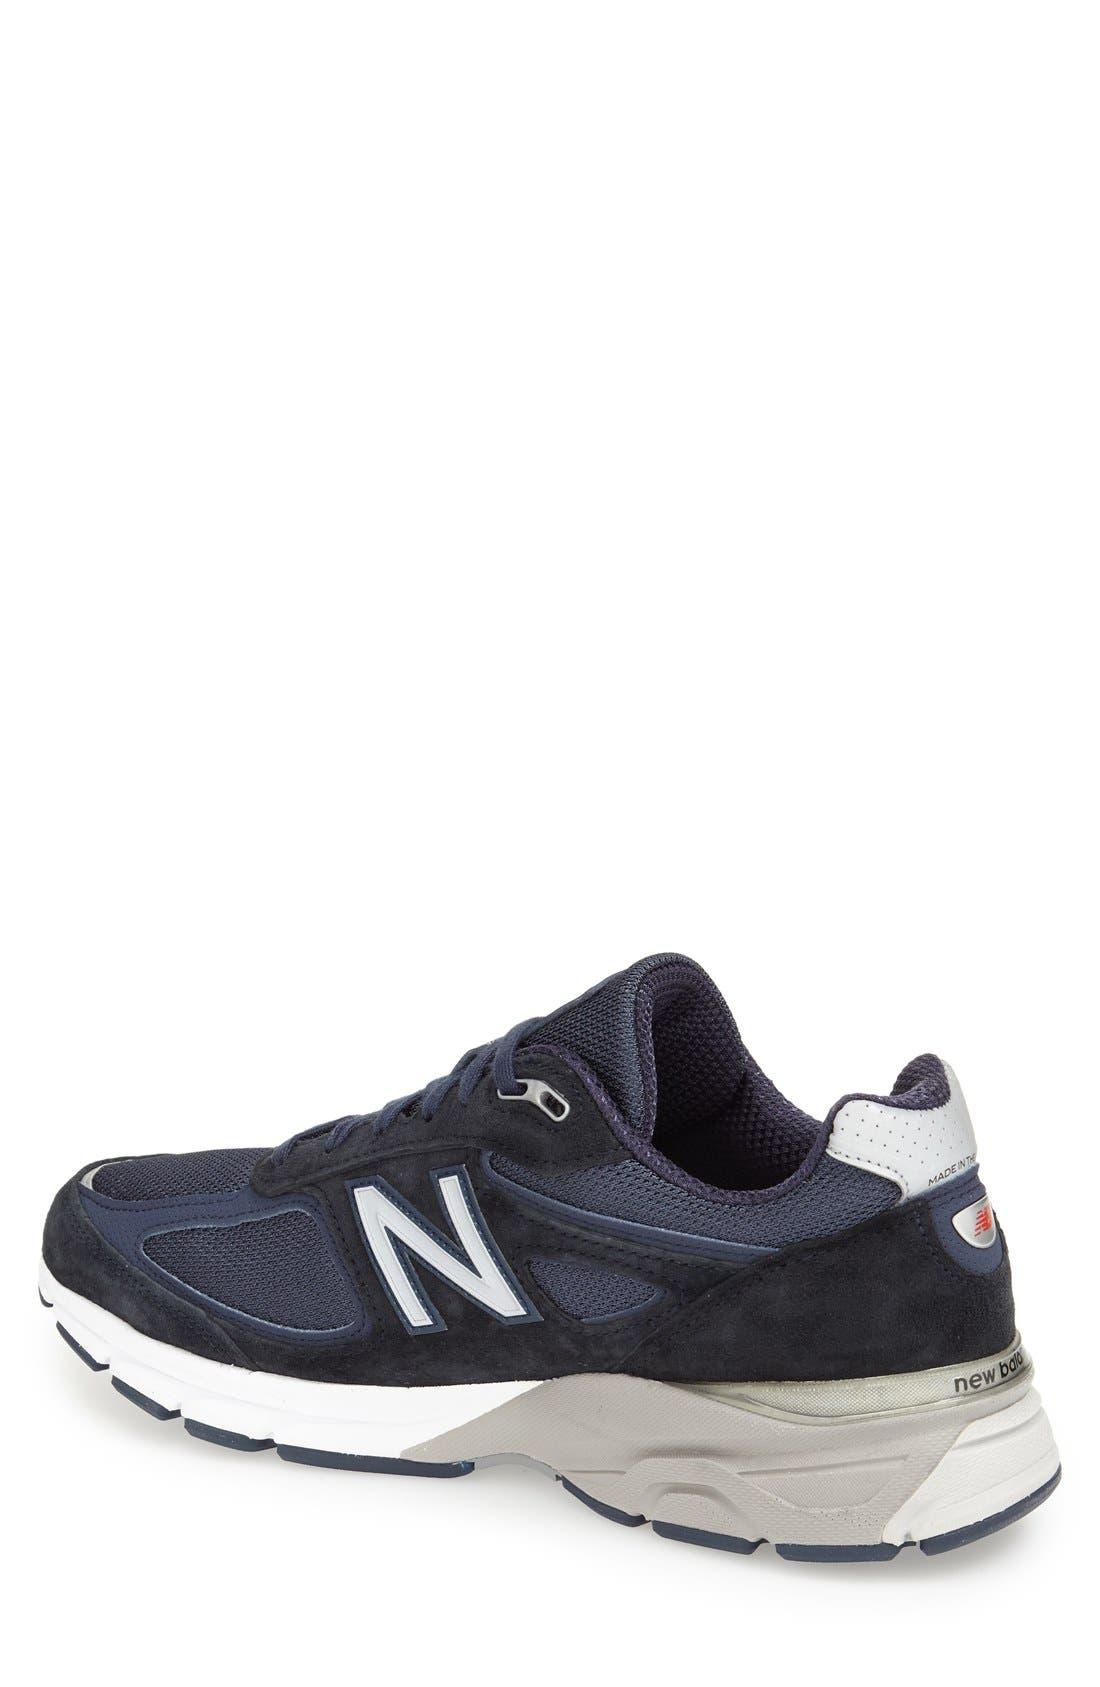 NEW BALANCE, '990' Running Shoe, Alternate thumbnail 2, color, NAVY